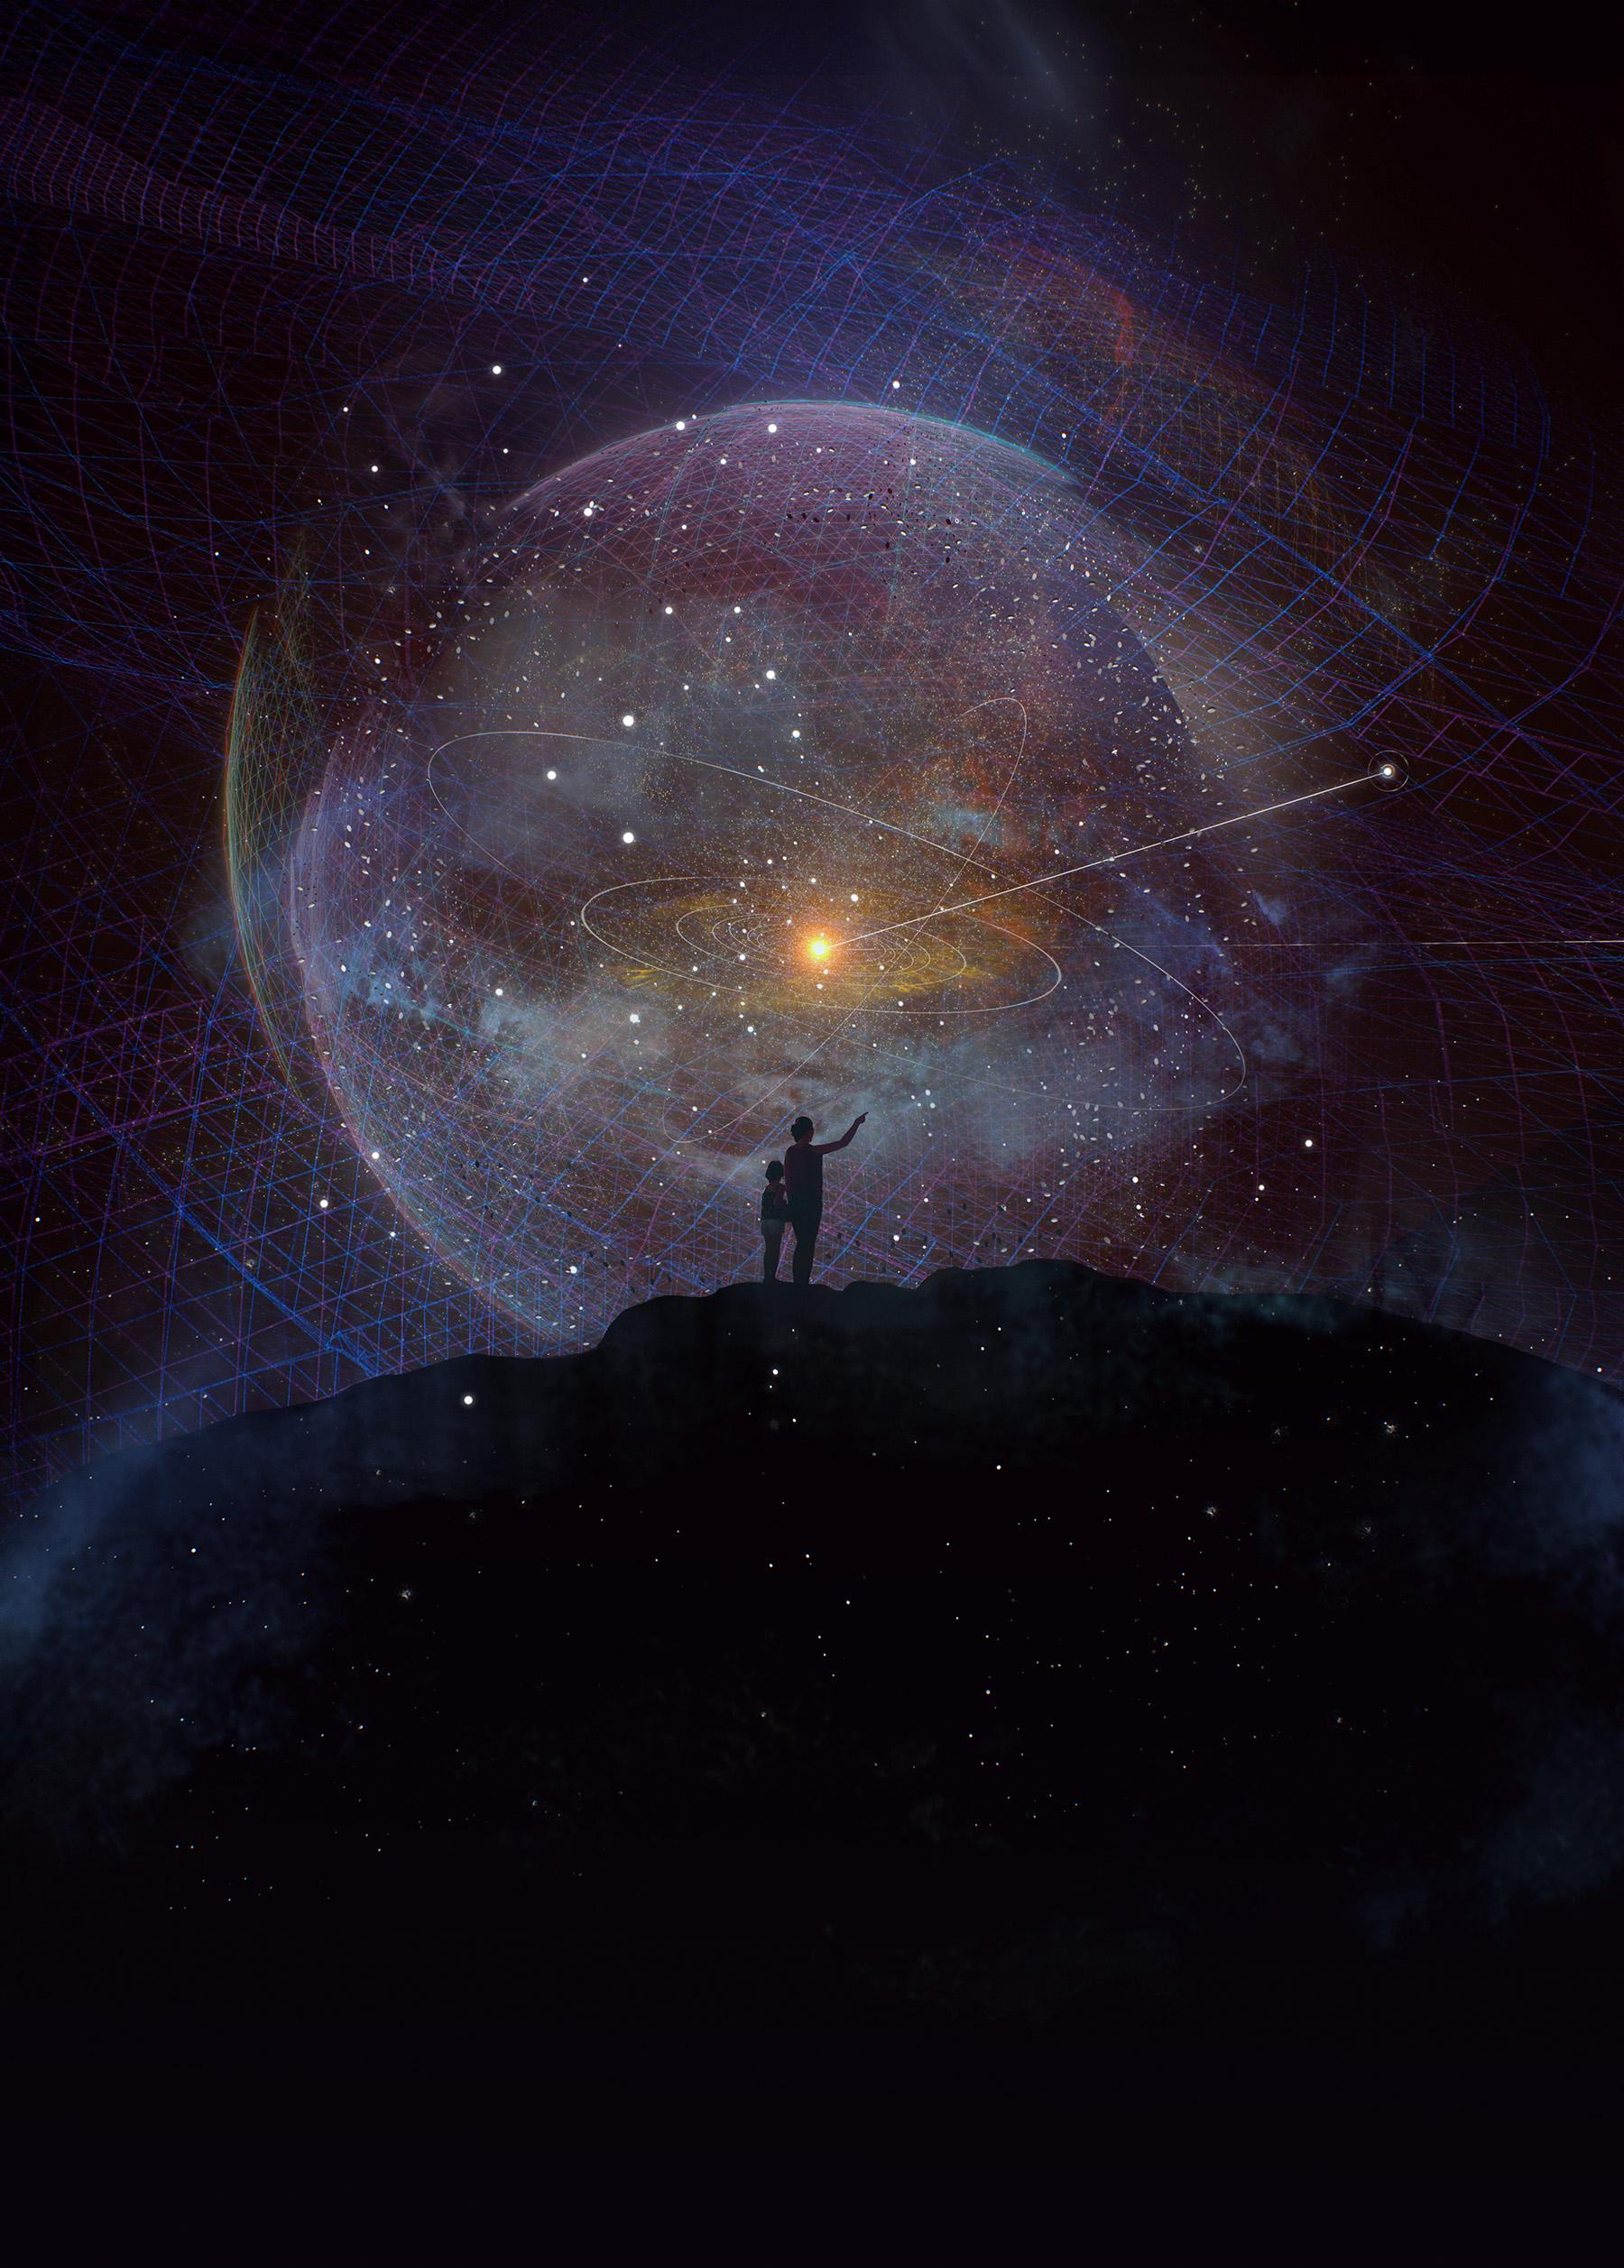 Interstellar Probe Graphic. Image via Johns Hopkins APL.